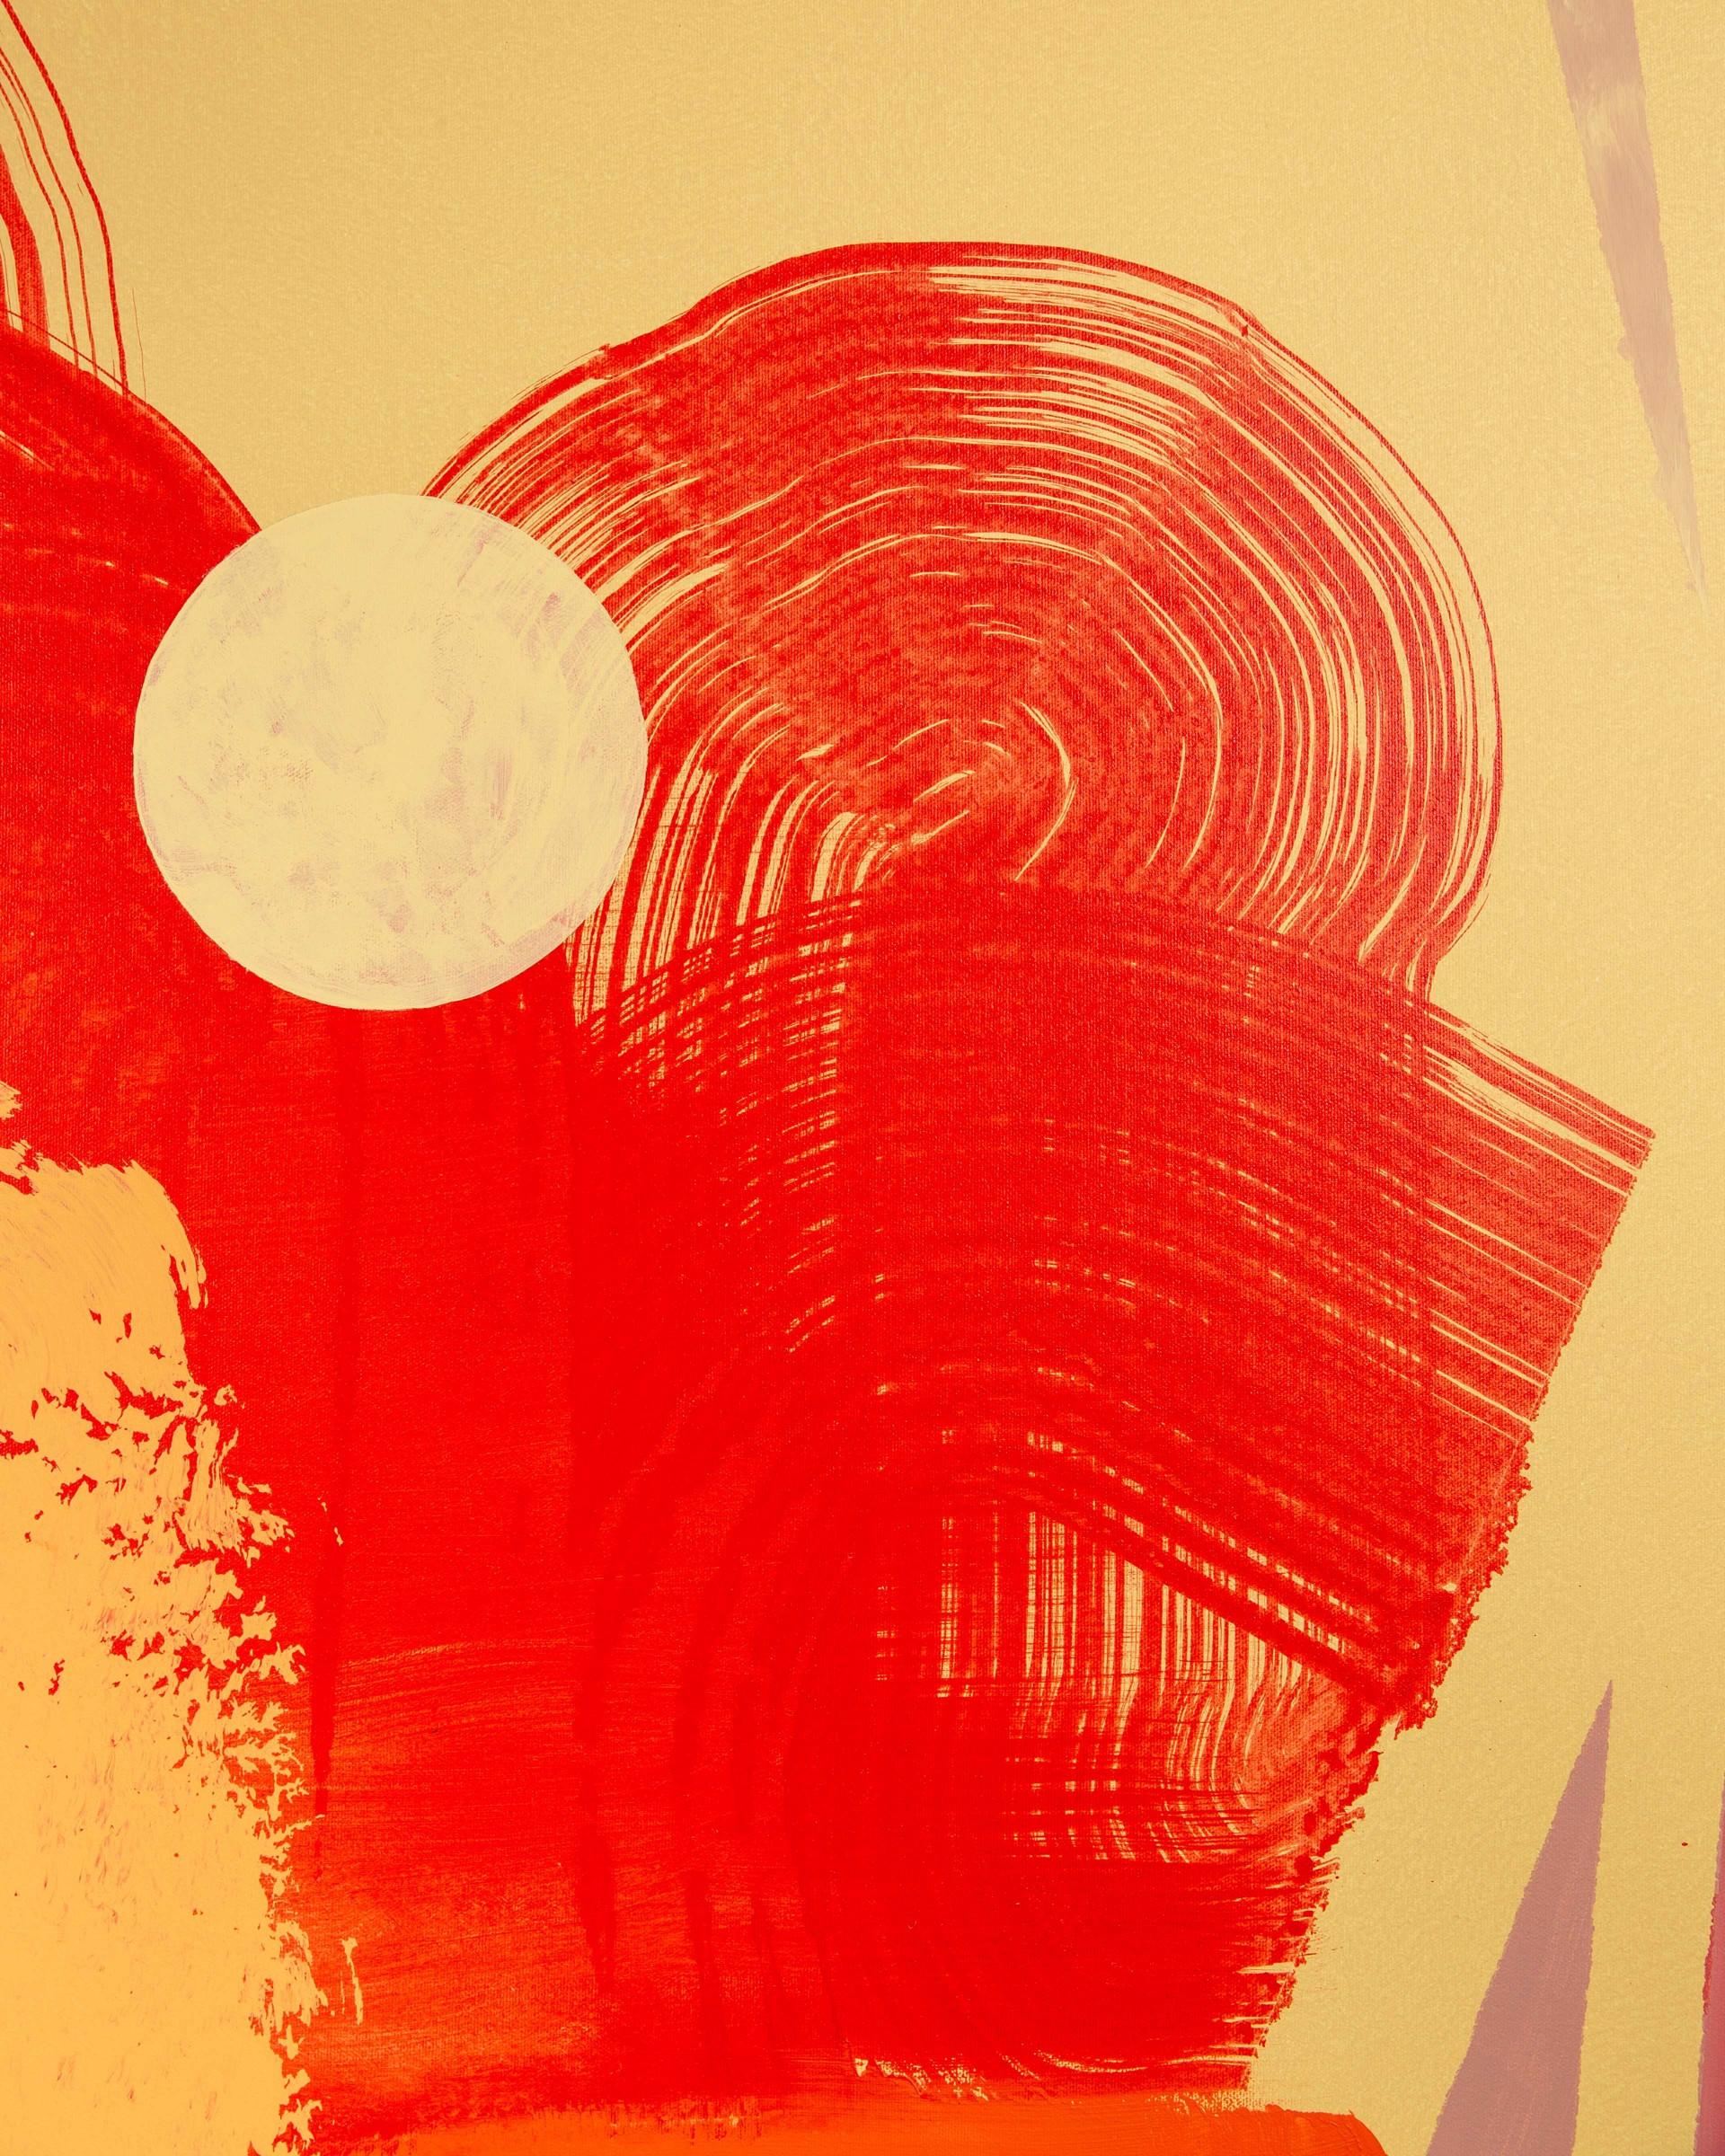 Volcanic Heart by Kevin Ledo